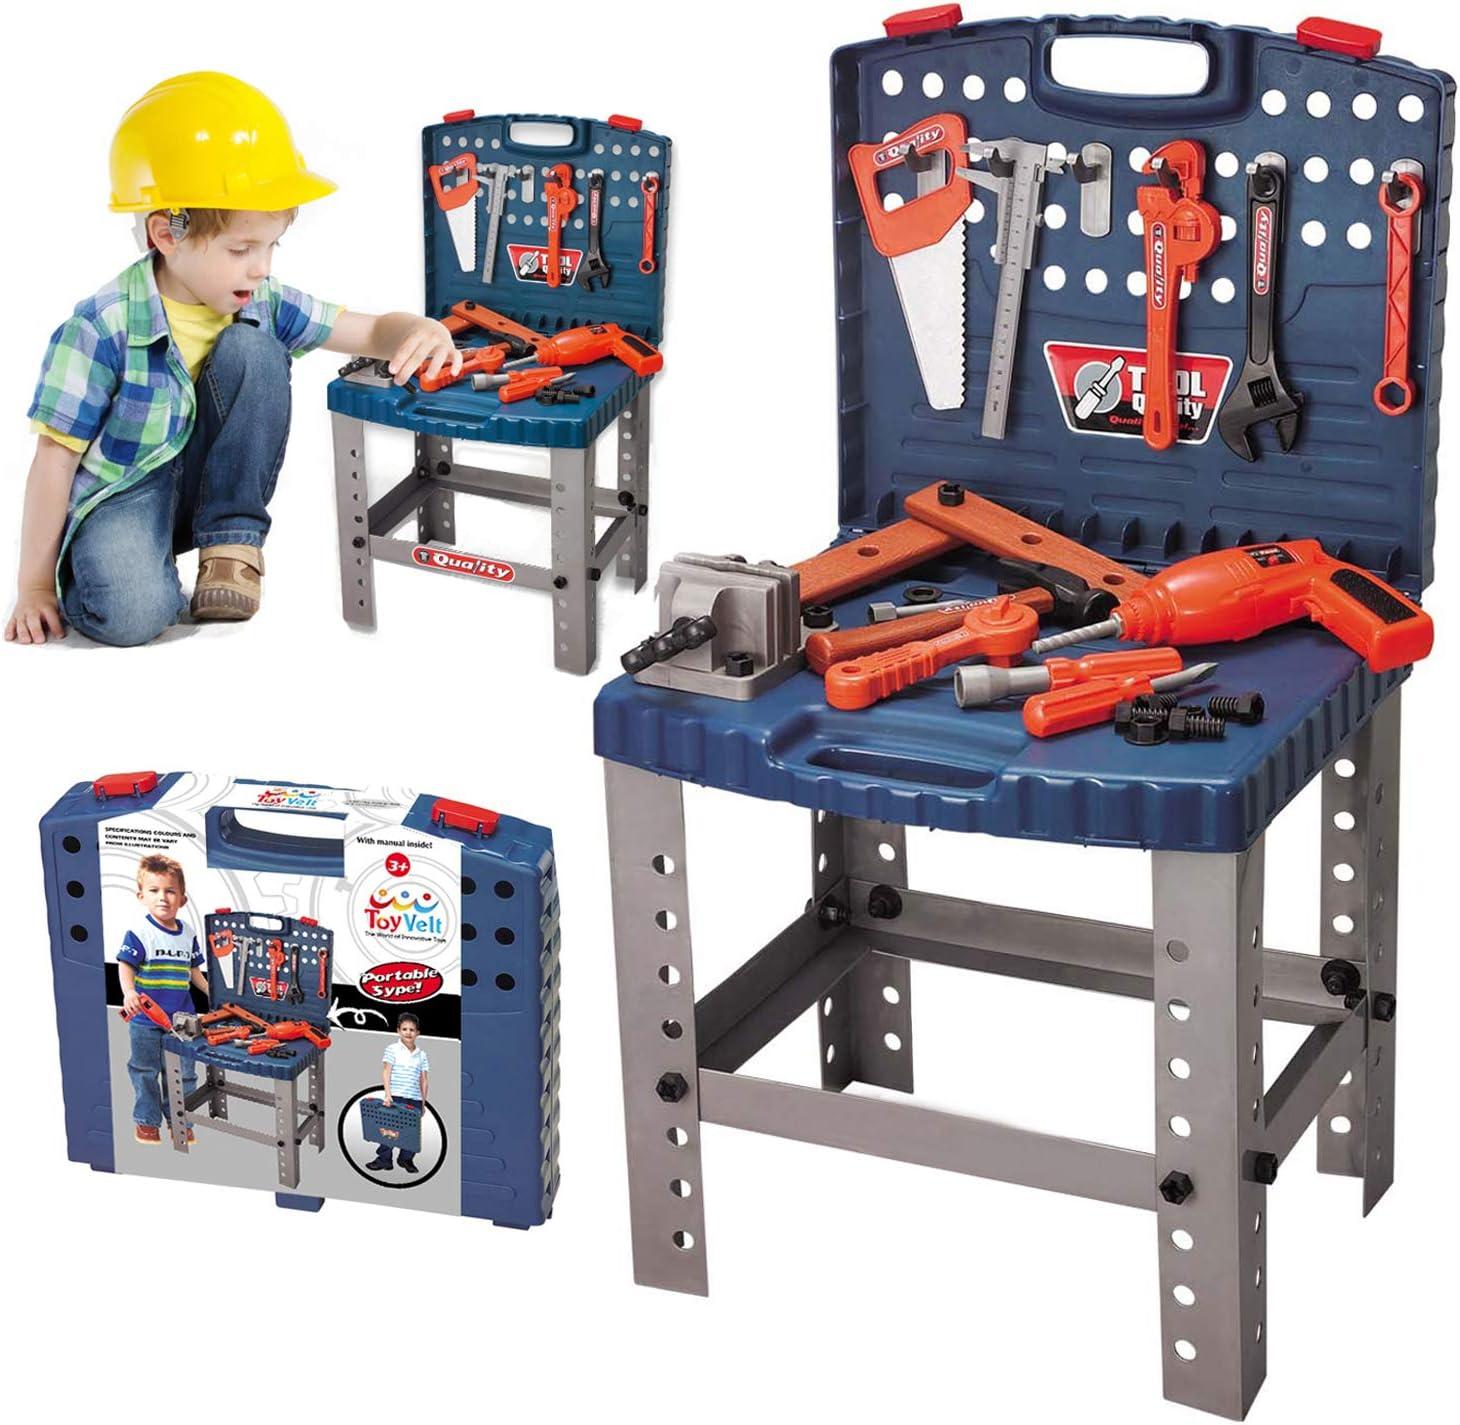 68 Piece Kids Toy Workbench W Realistic Tools und Electric Drill für Construction Workshop Tool Bench, Stem Educational Play, Pretend Play, Birthday Gifts und Toolbox für Alter 3 - 10 Yrs Old